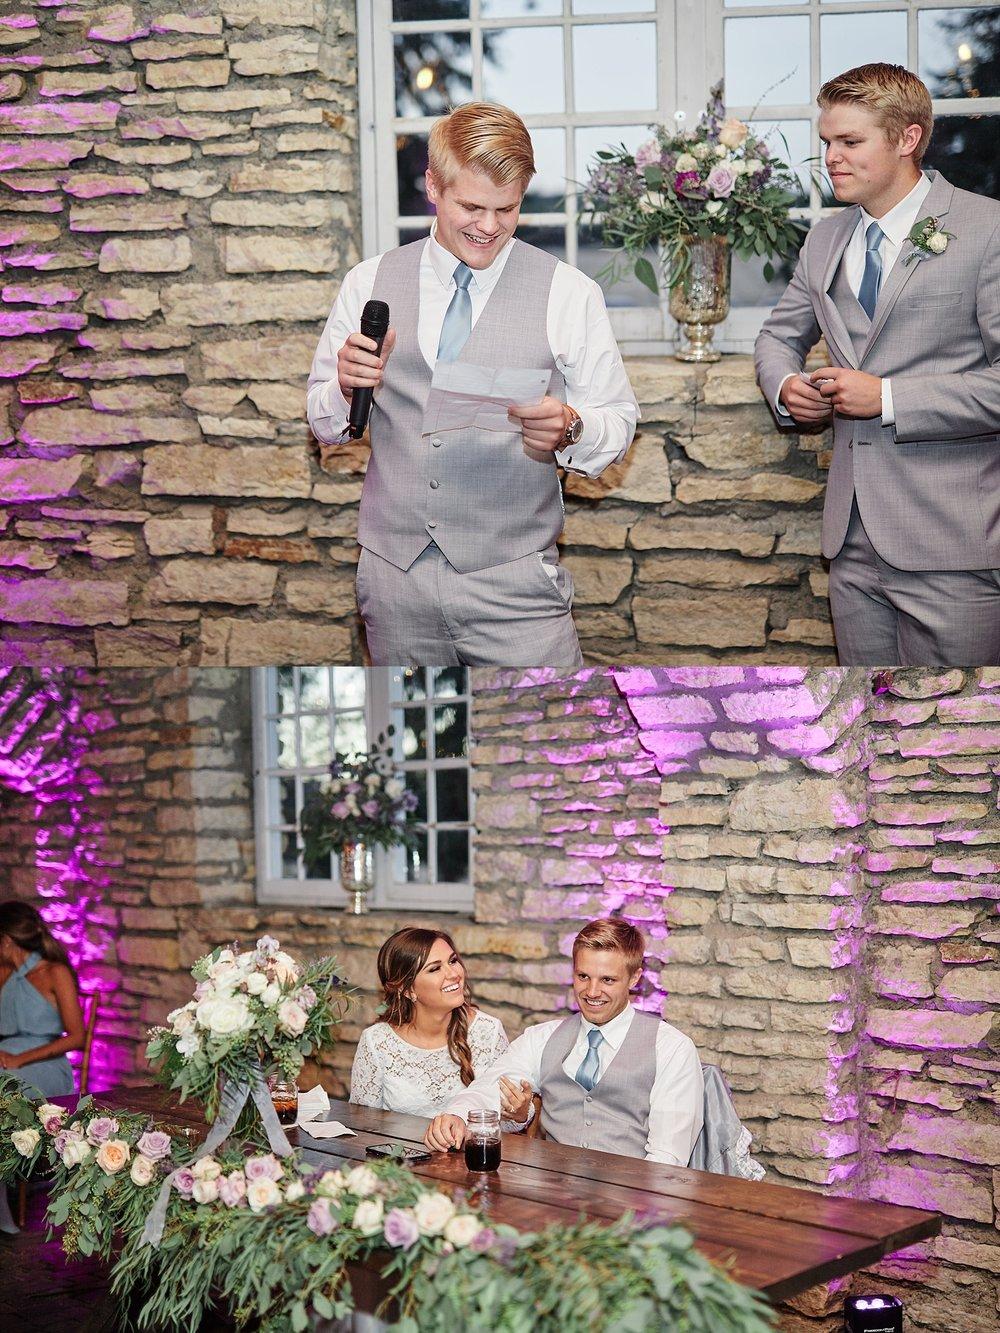 Maywood-Stone-Barn-Wedding-Rochester-Minnesota-Perry-James-Photo_0682.jpg